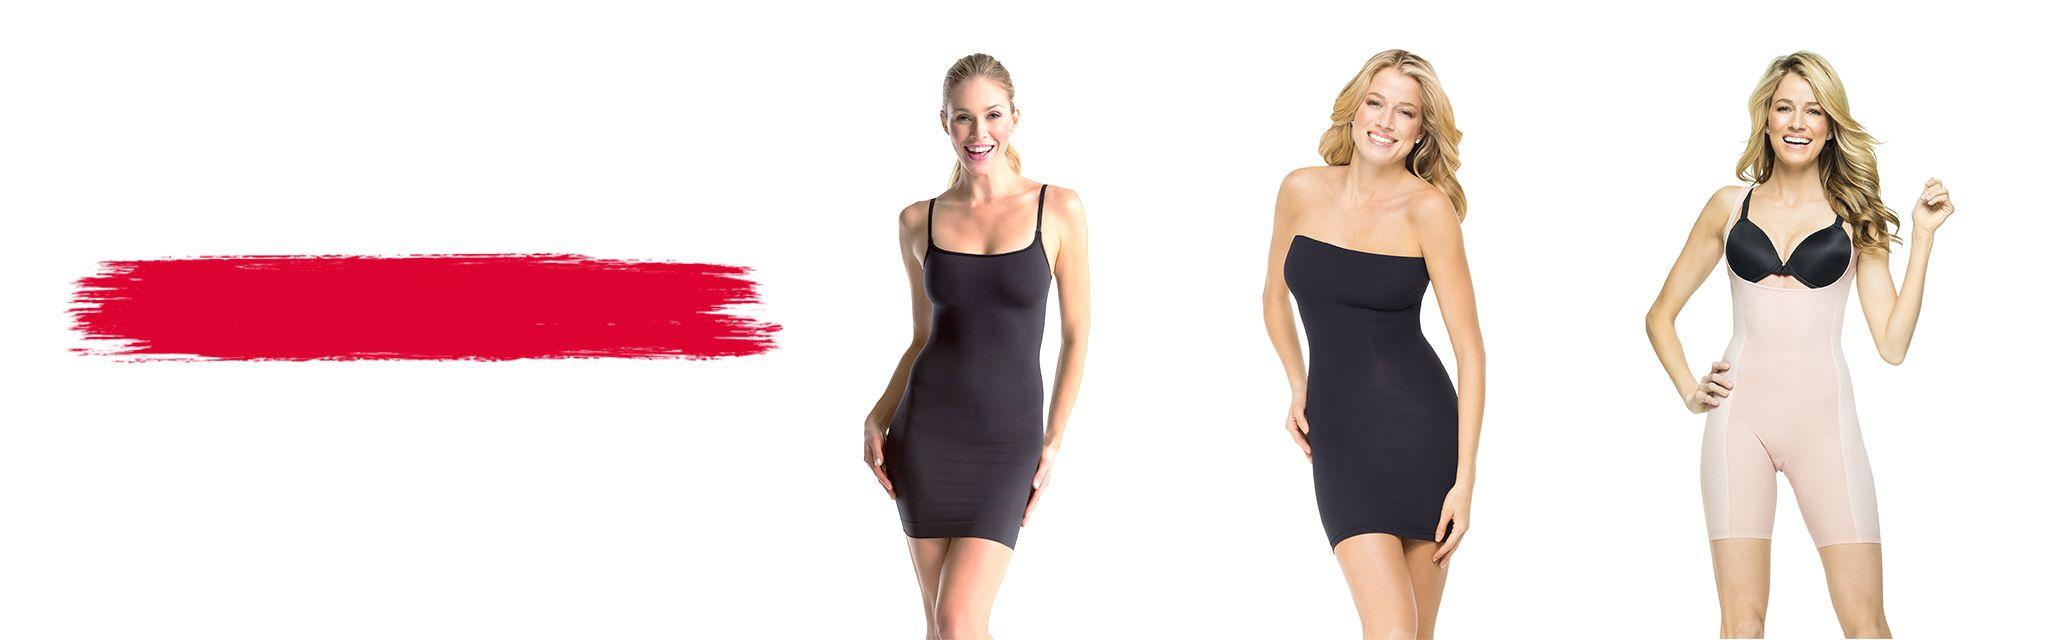 3 Spanx Models Wearing Slips & Bodysuits